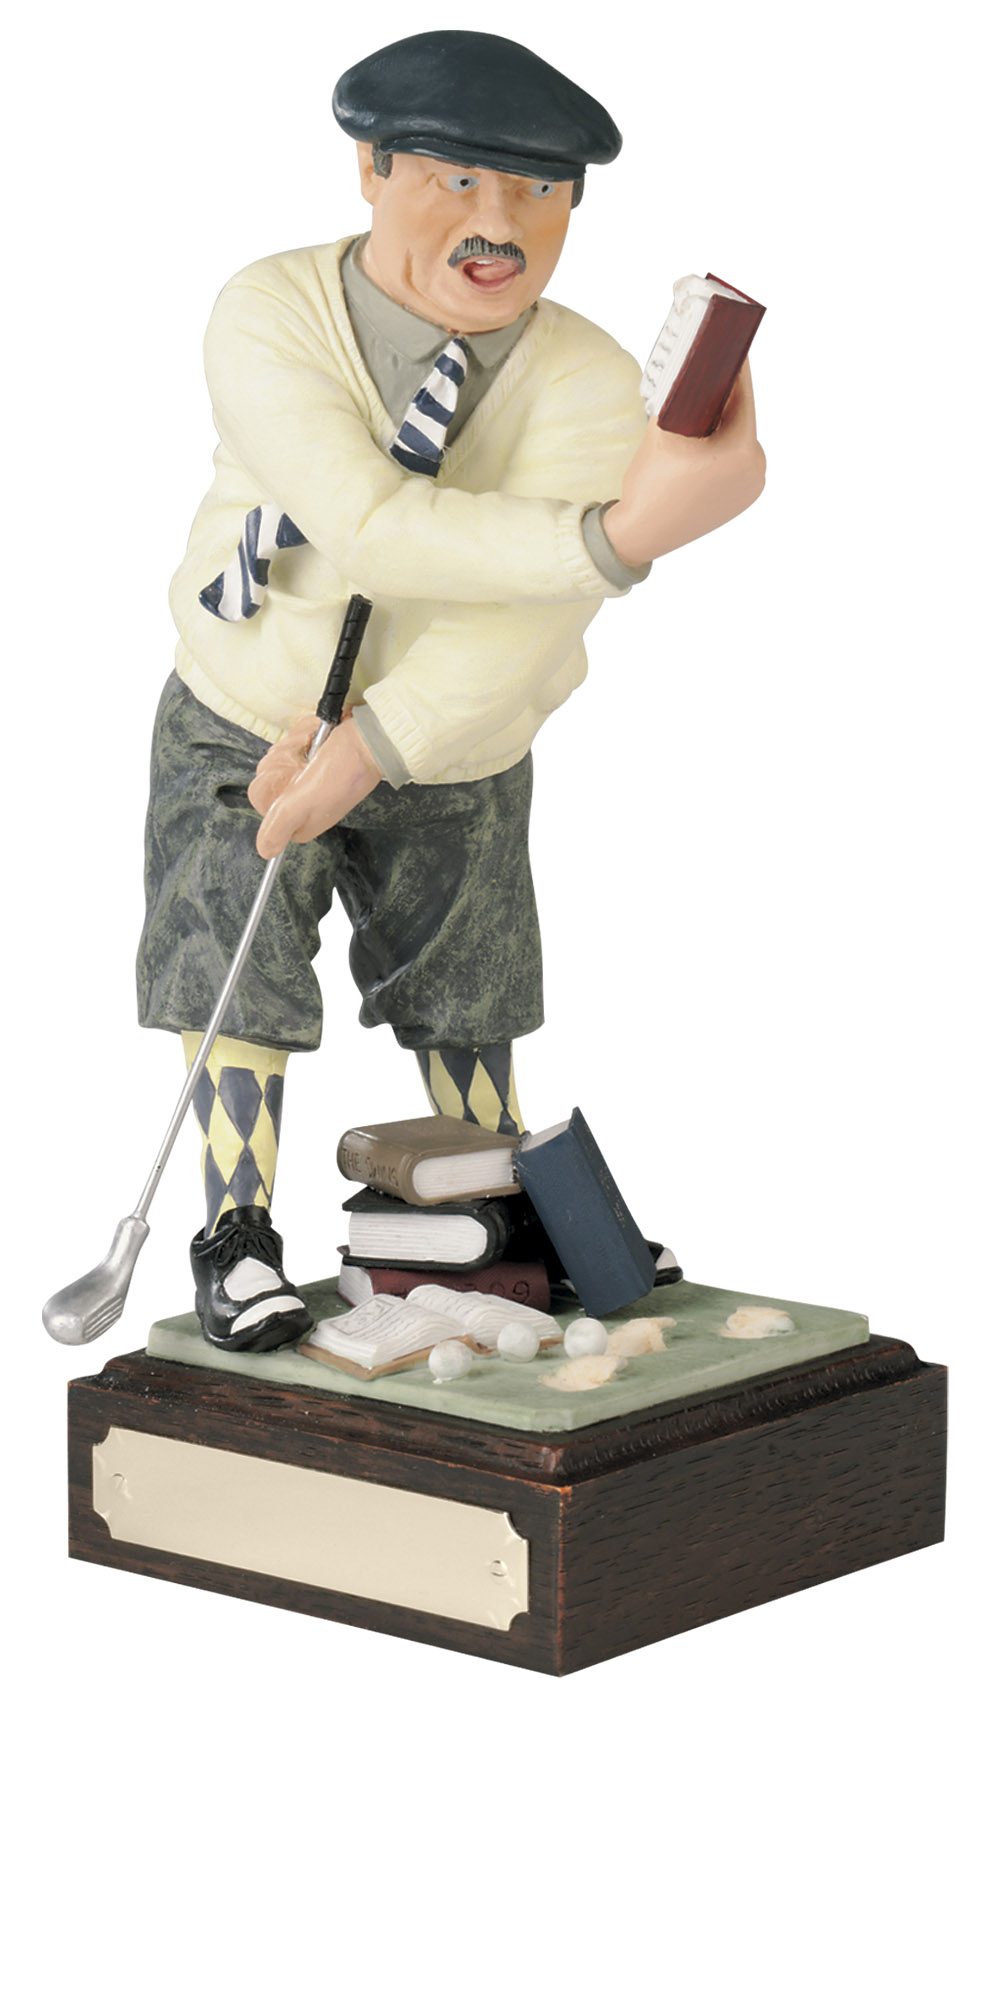 Golf made easy